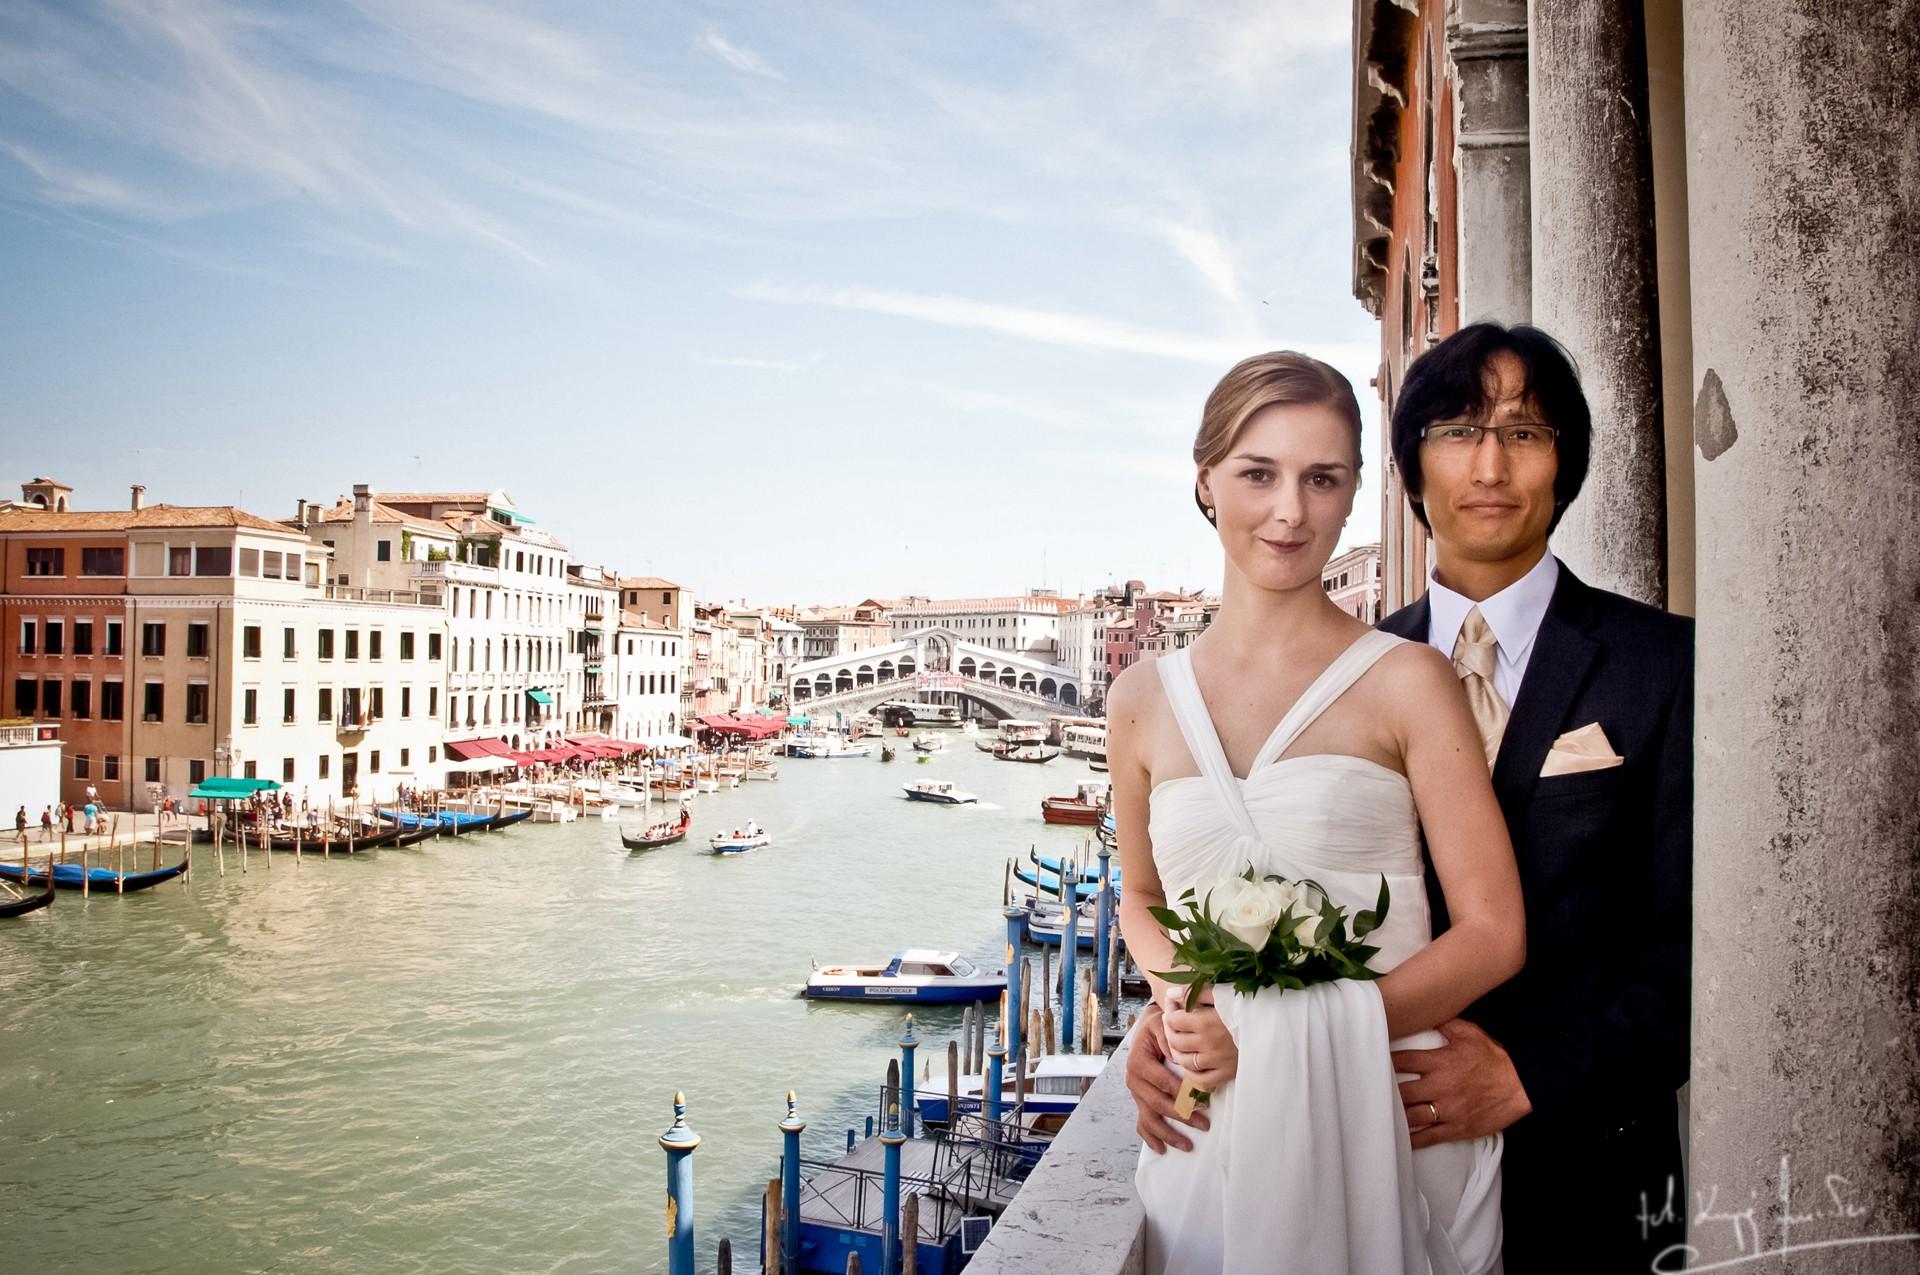 Ślub w wenecji 36 Manuela Luiza & Young Seon Song